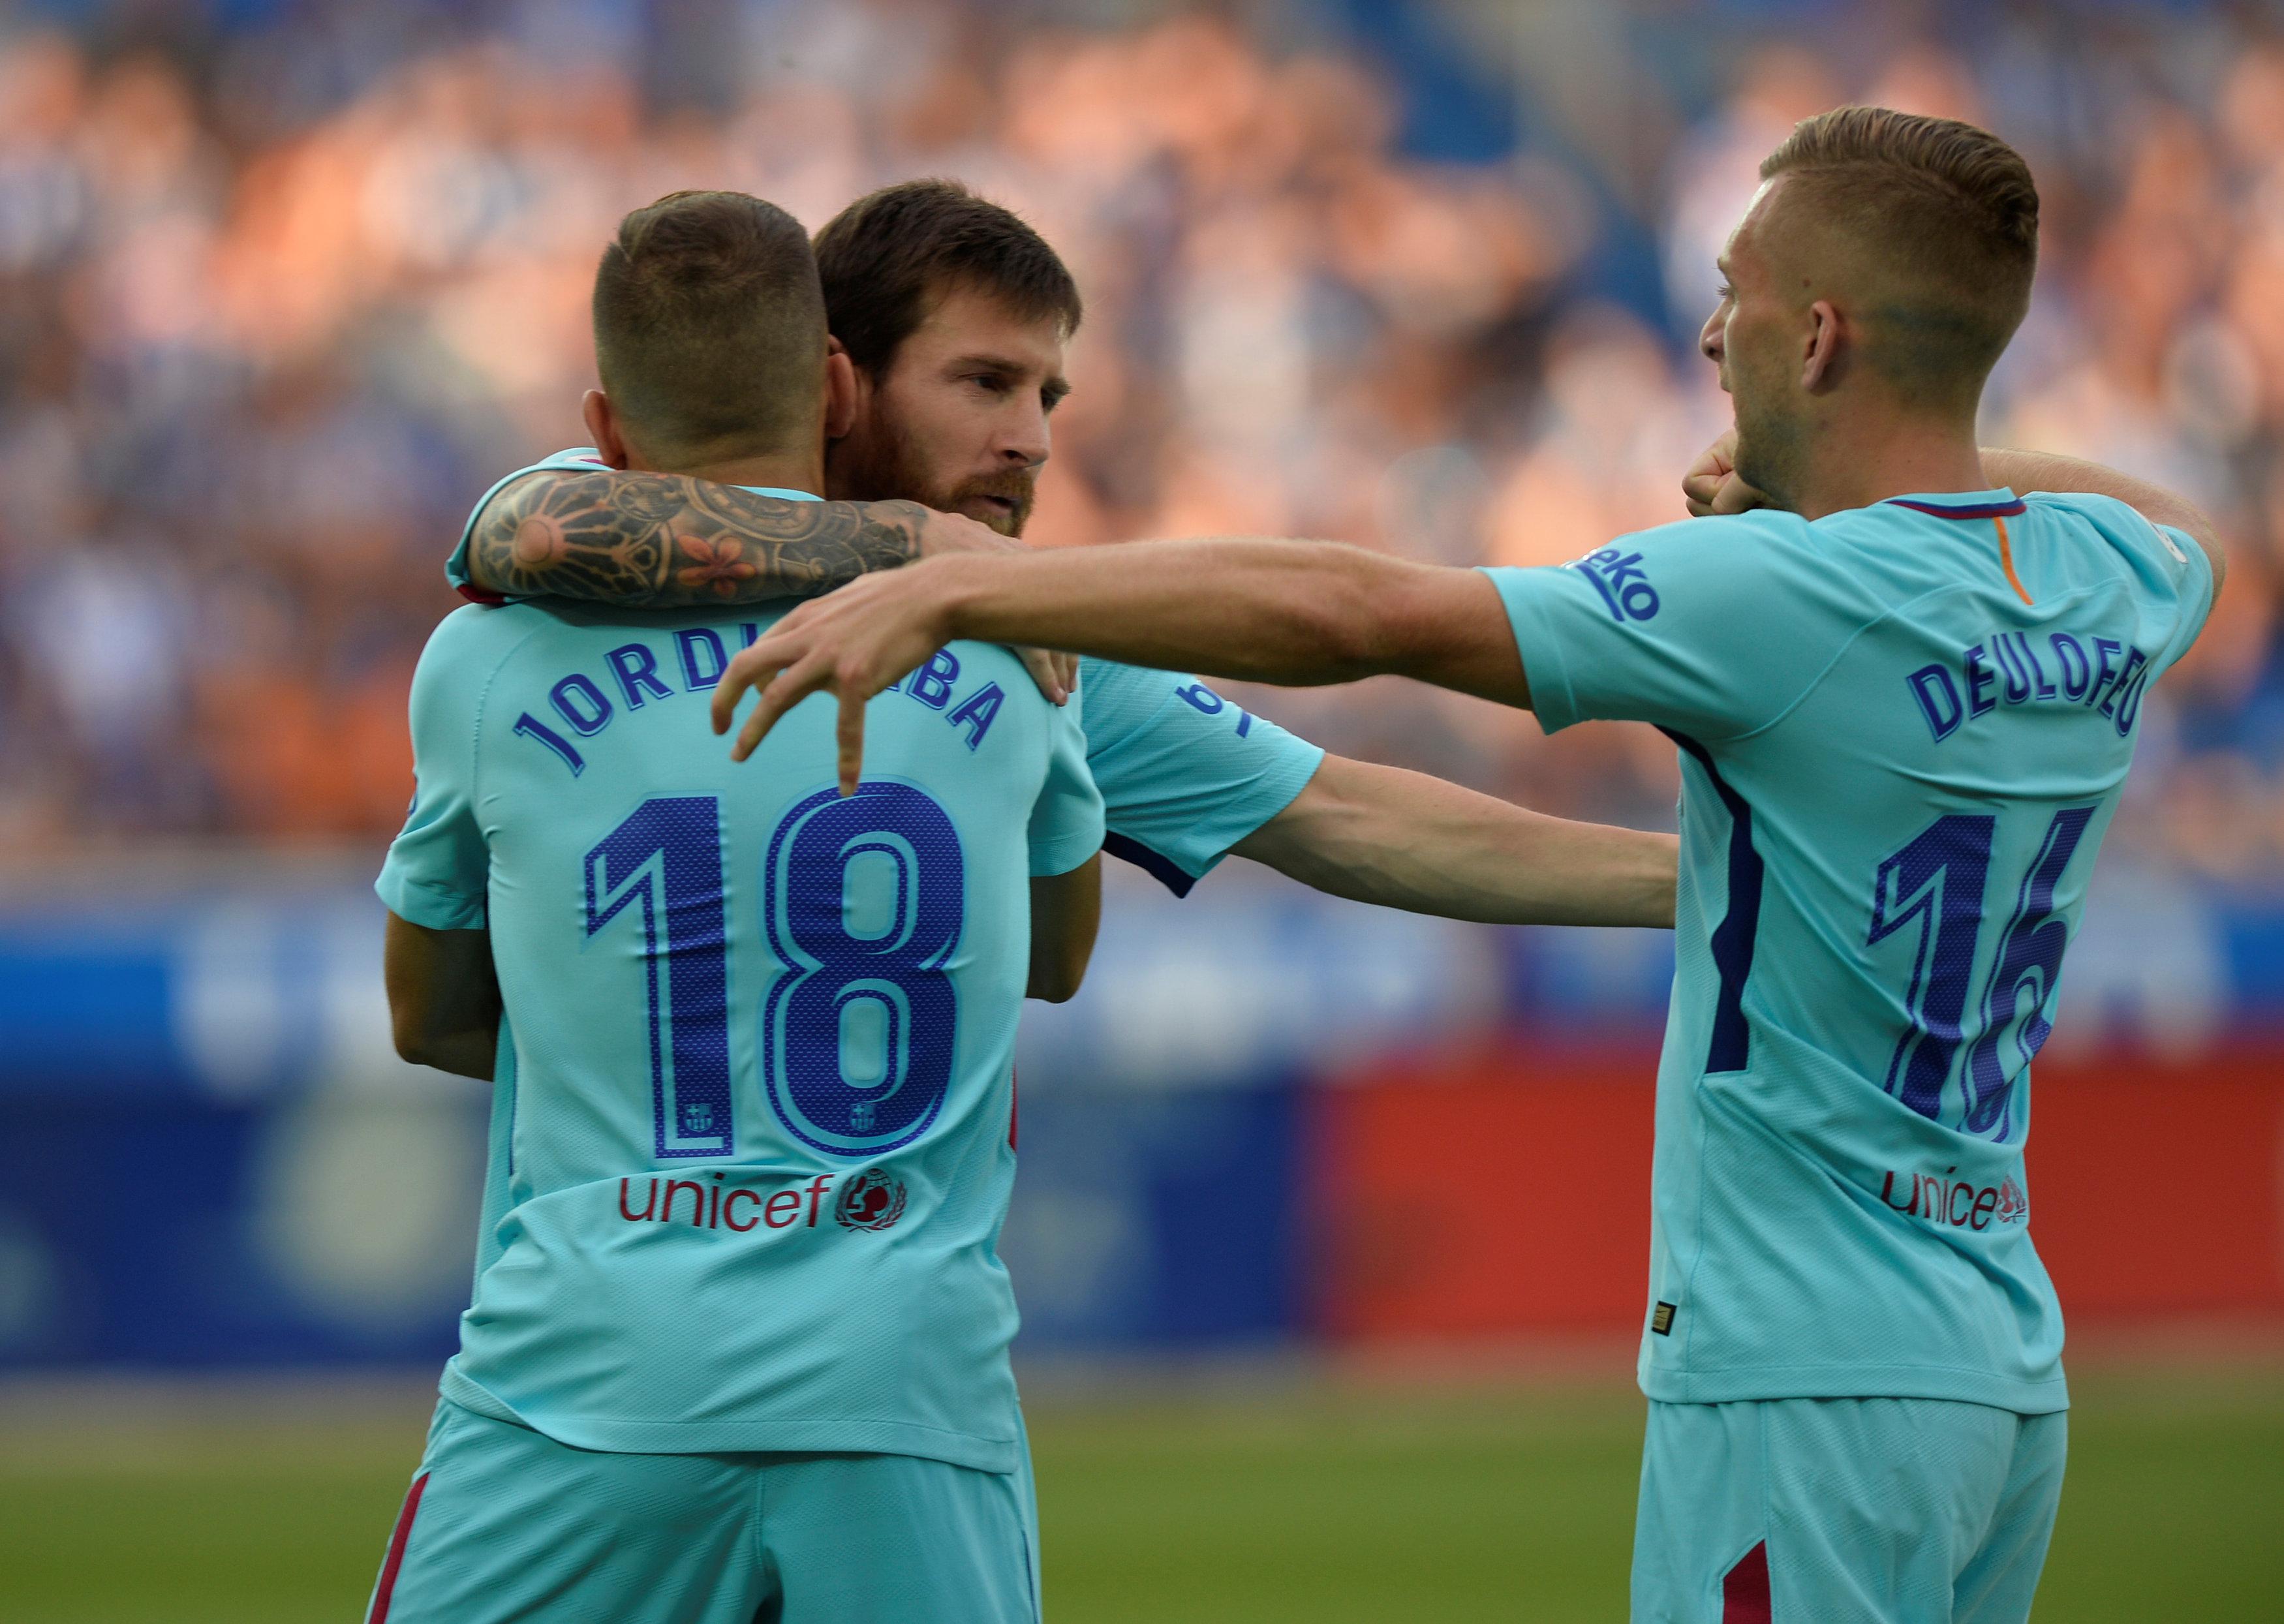 Football: Messi double gives Barca win at Alaves